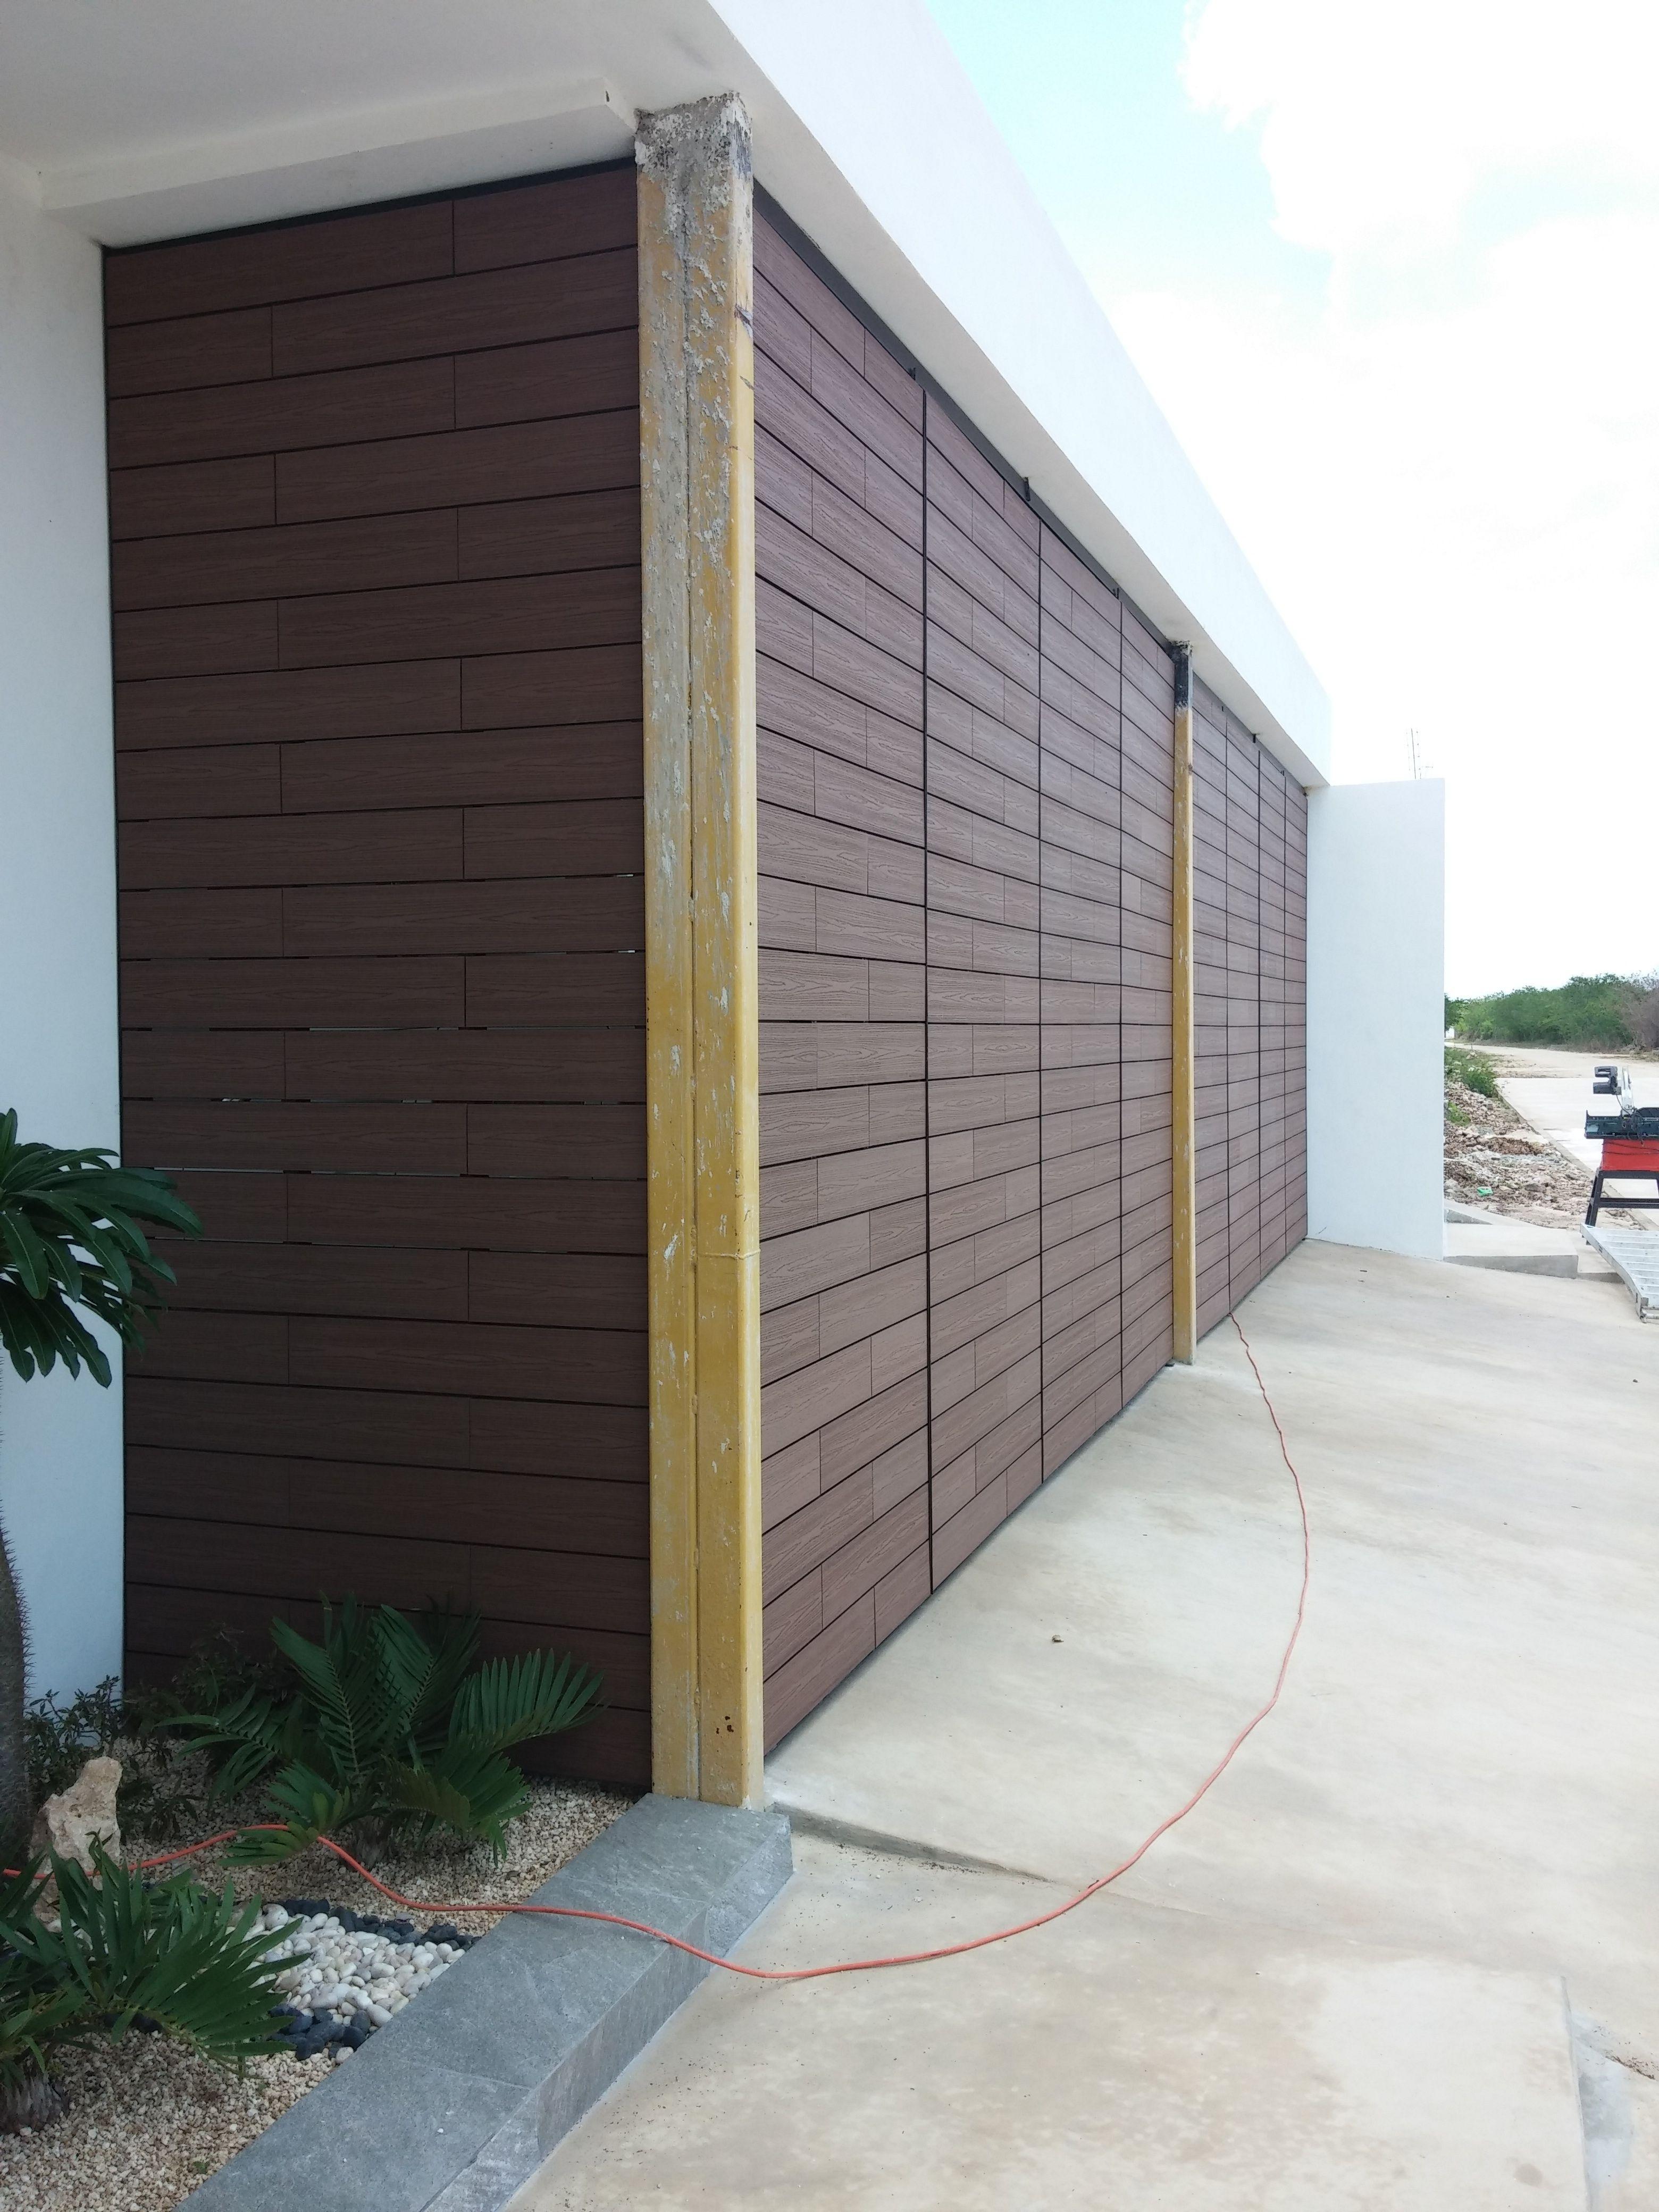 Decorative Pvc Wall Panels Outdoor Wall Panels Basement Wall Panels Pvc Wall Panels